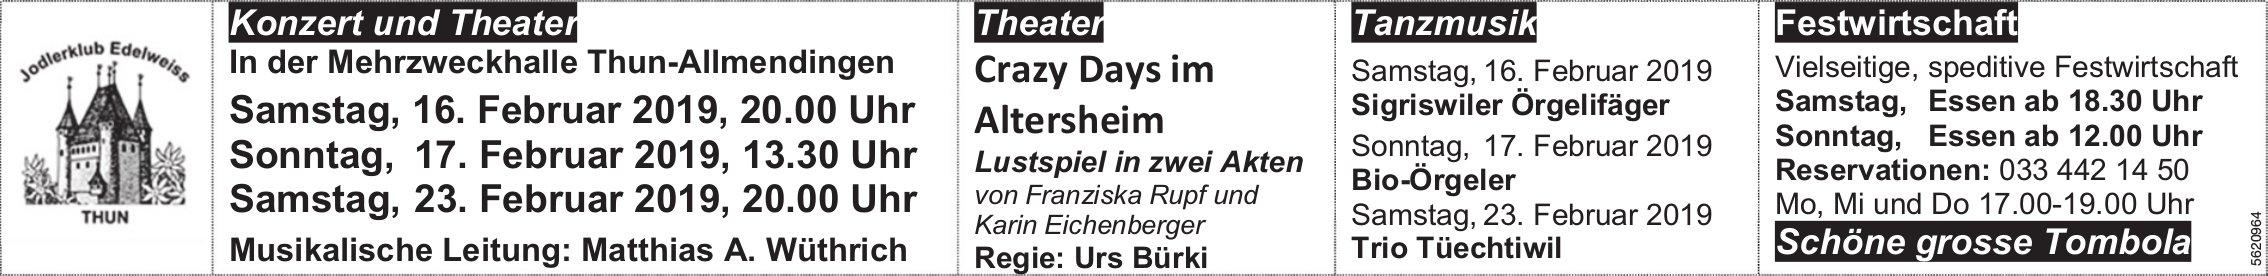 Jodlerklub Edelweiss Thun - Konzert und Theater in Thun-Allmendingen, 16./17./23. Februar